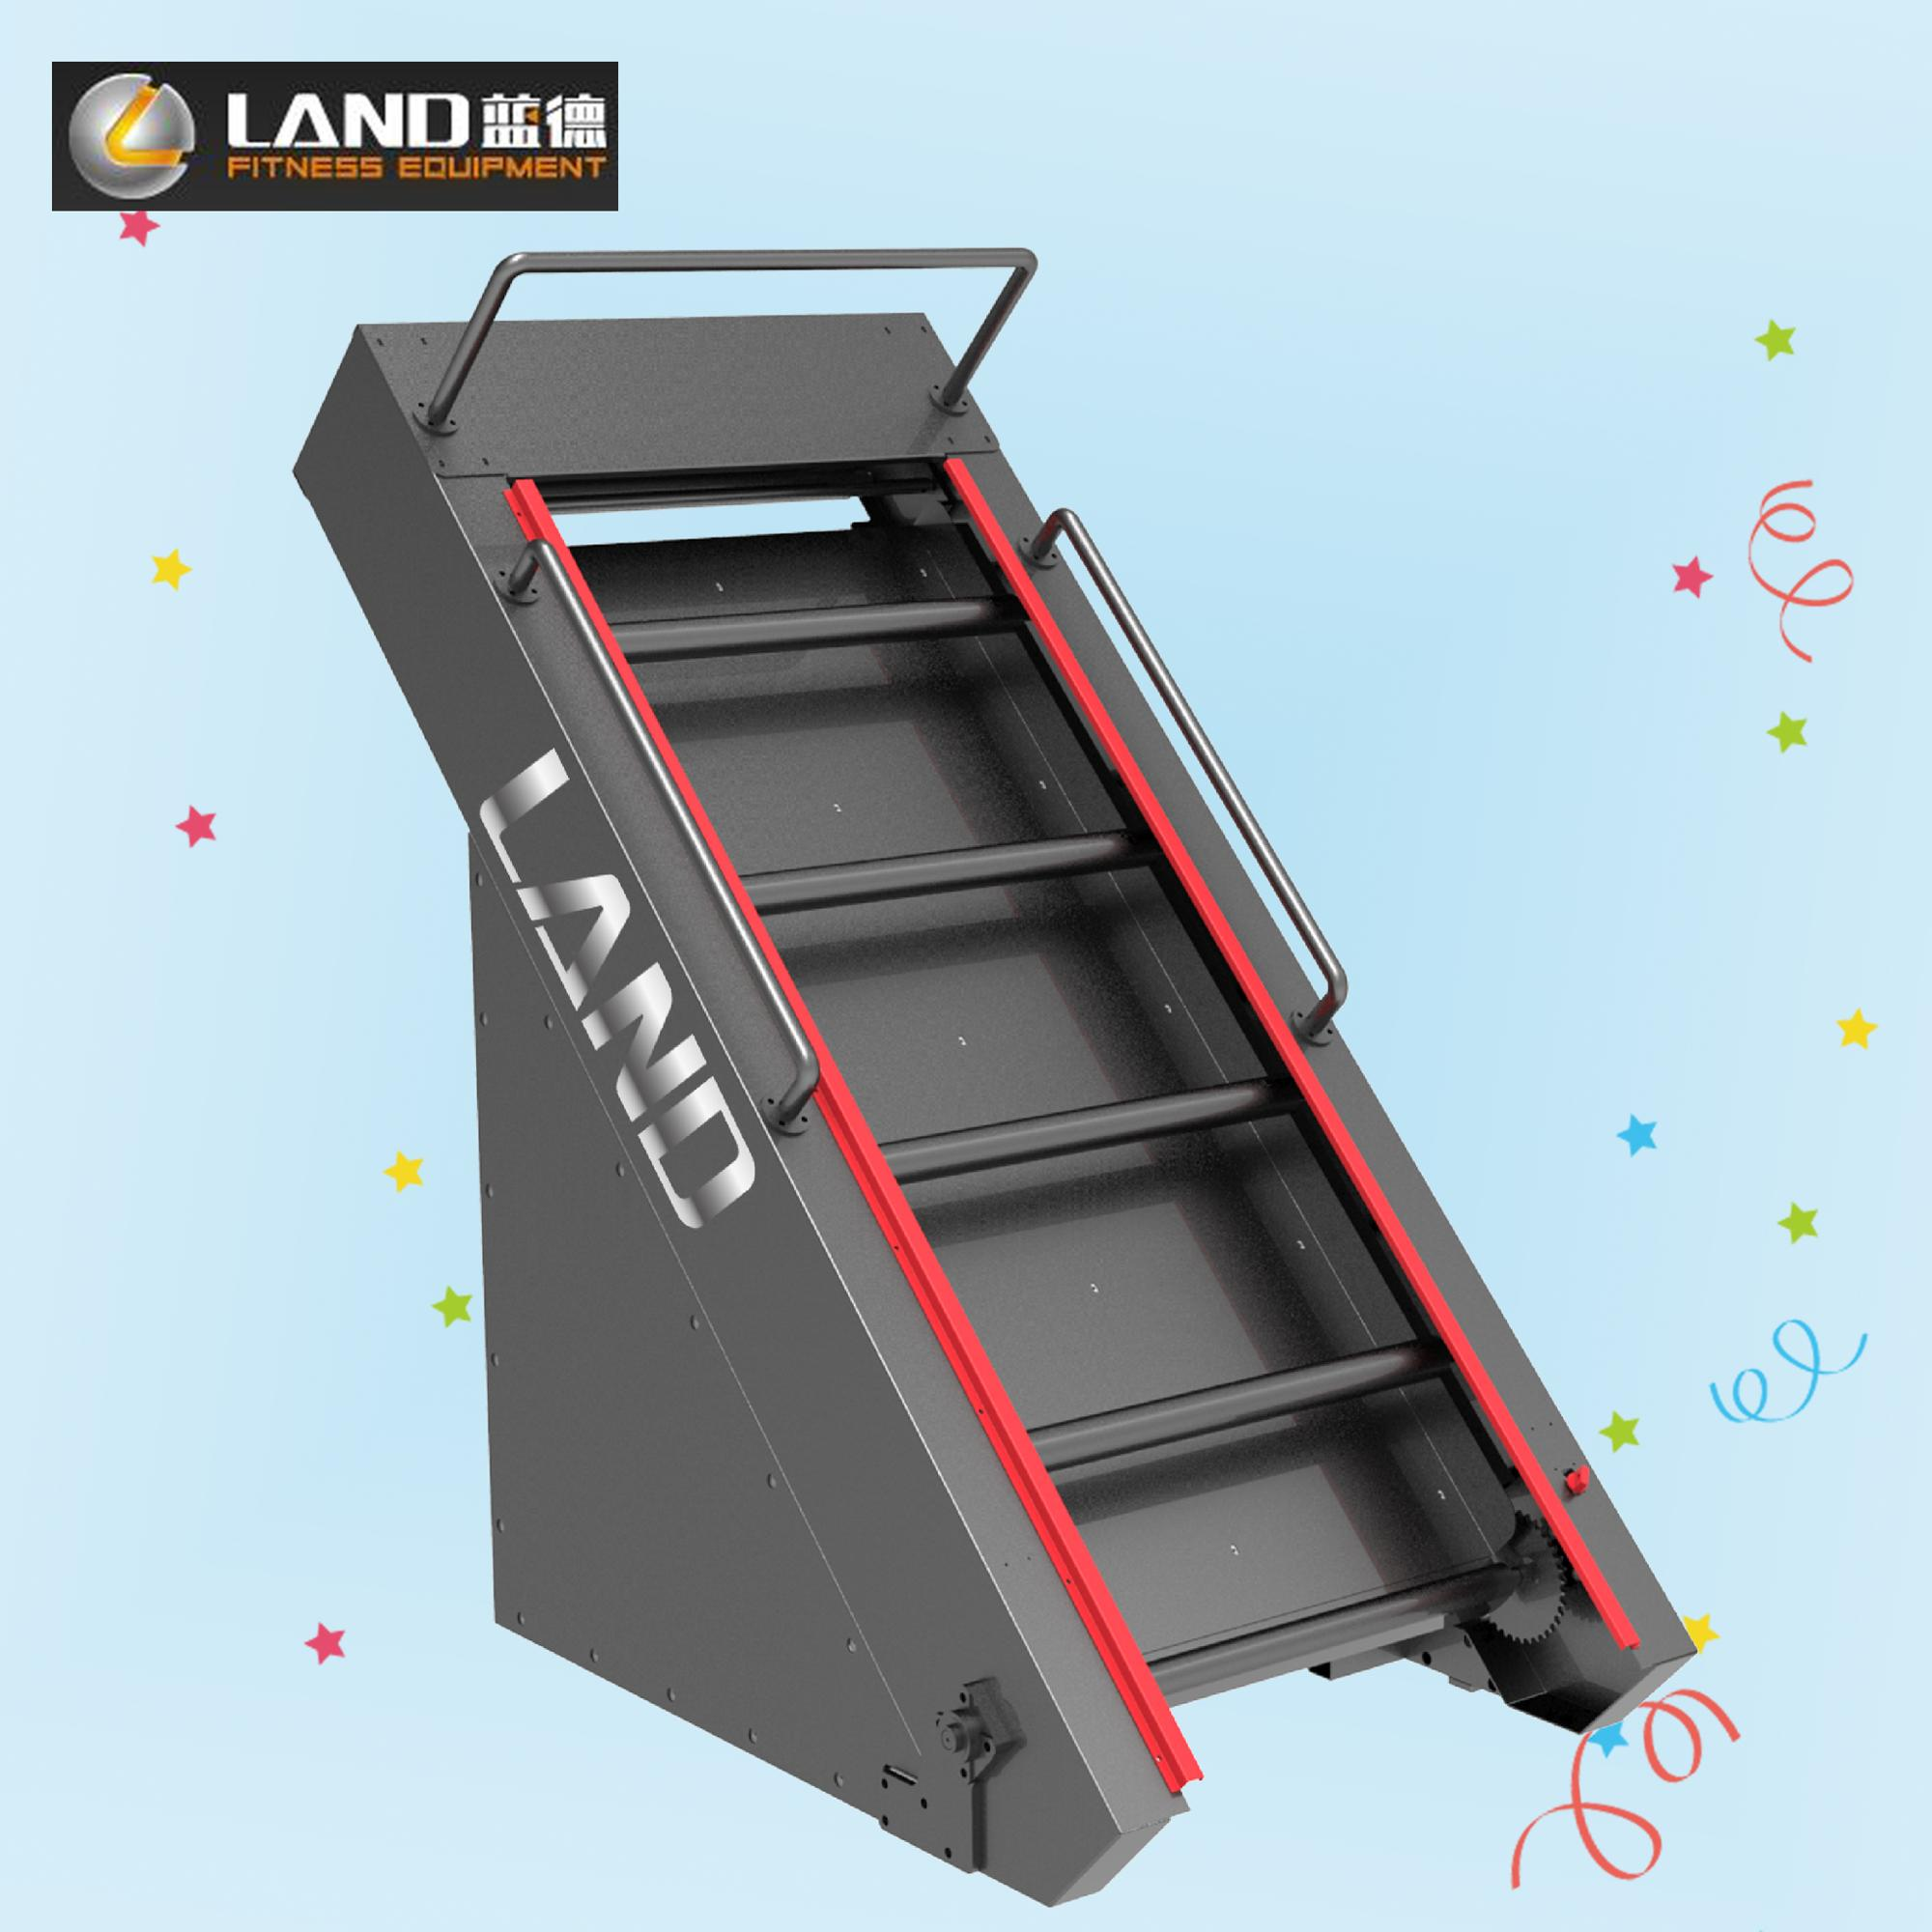 Speed Adjustable Climbing Machine Gym Cardio Equipment Land Fitness